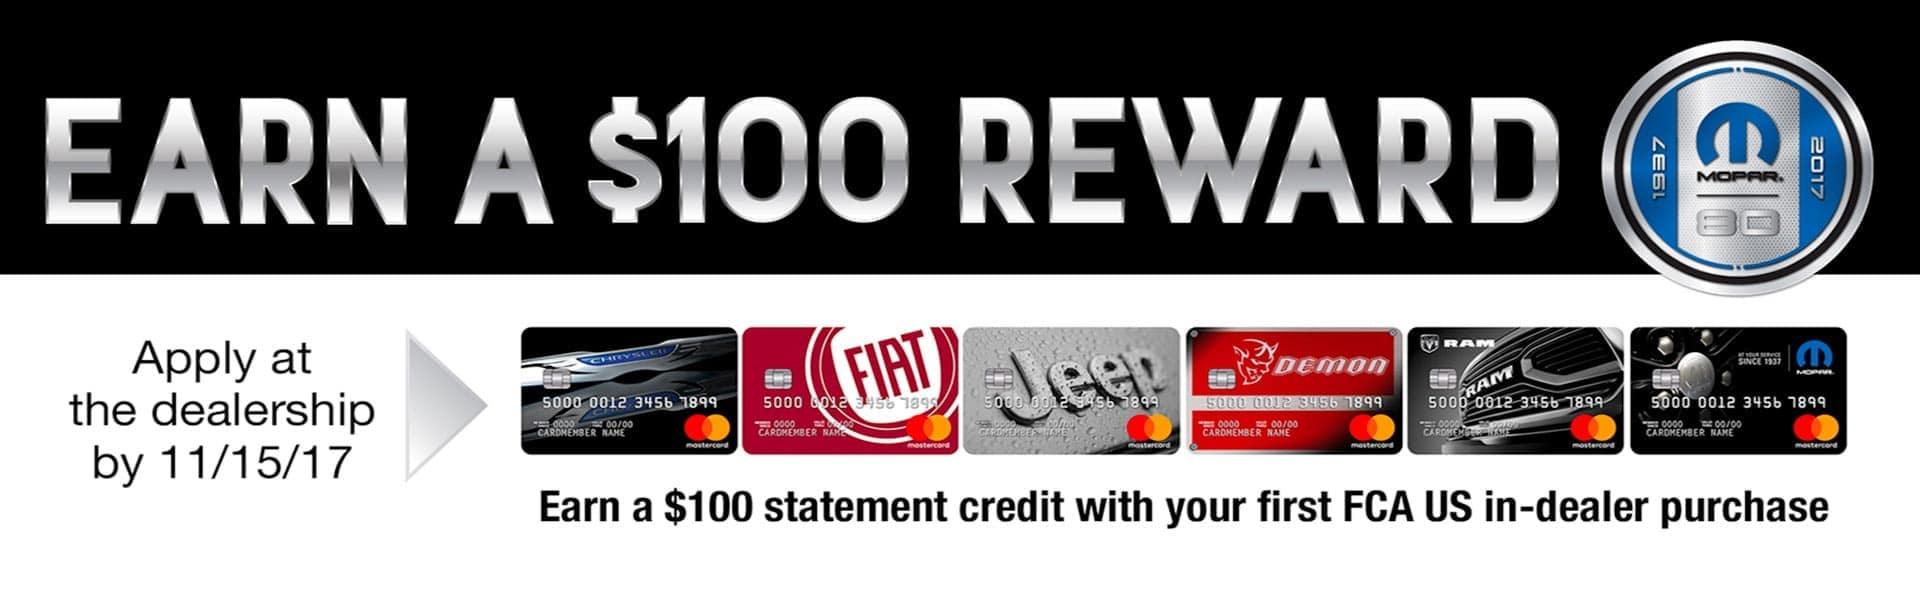 Mastercard Reward